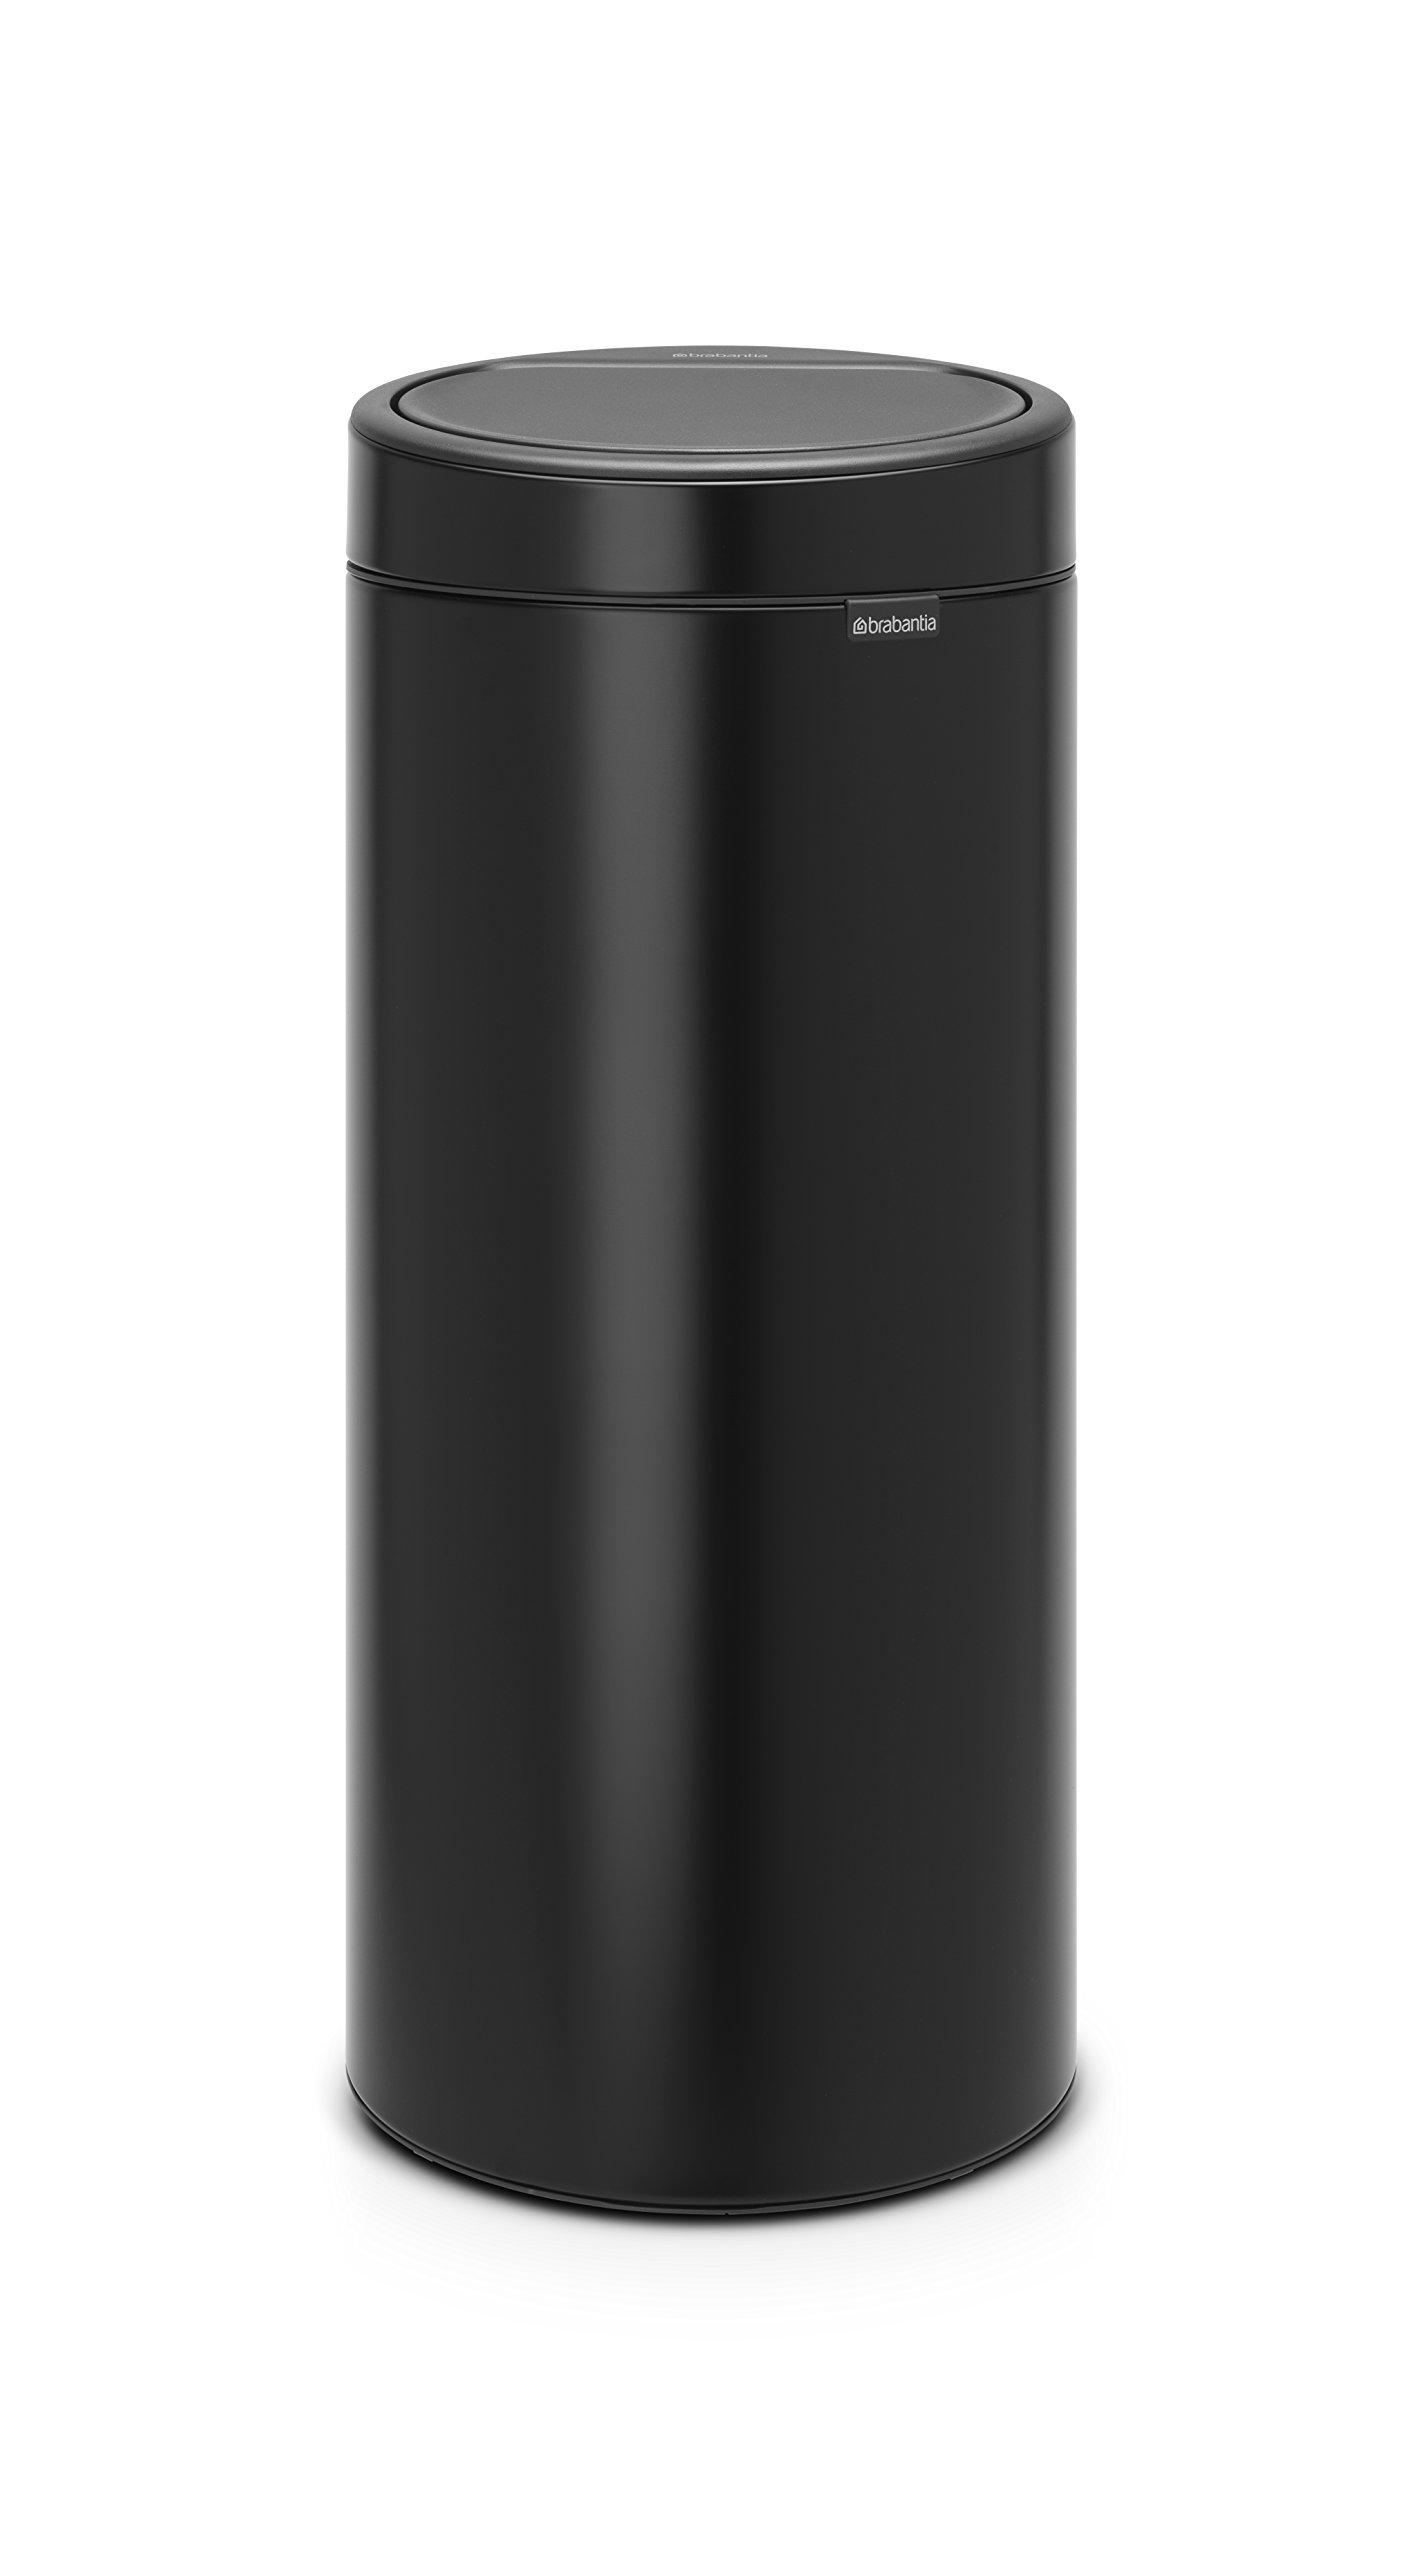 Brabantia 115301 Touch Trash Can New, 8 gallon, Matt Black by Brabantia